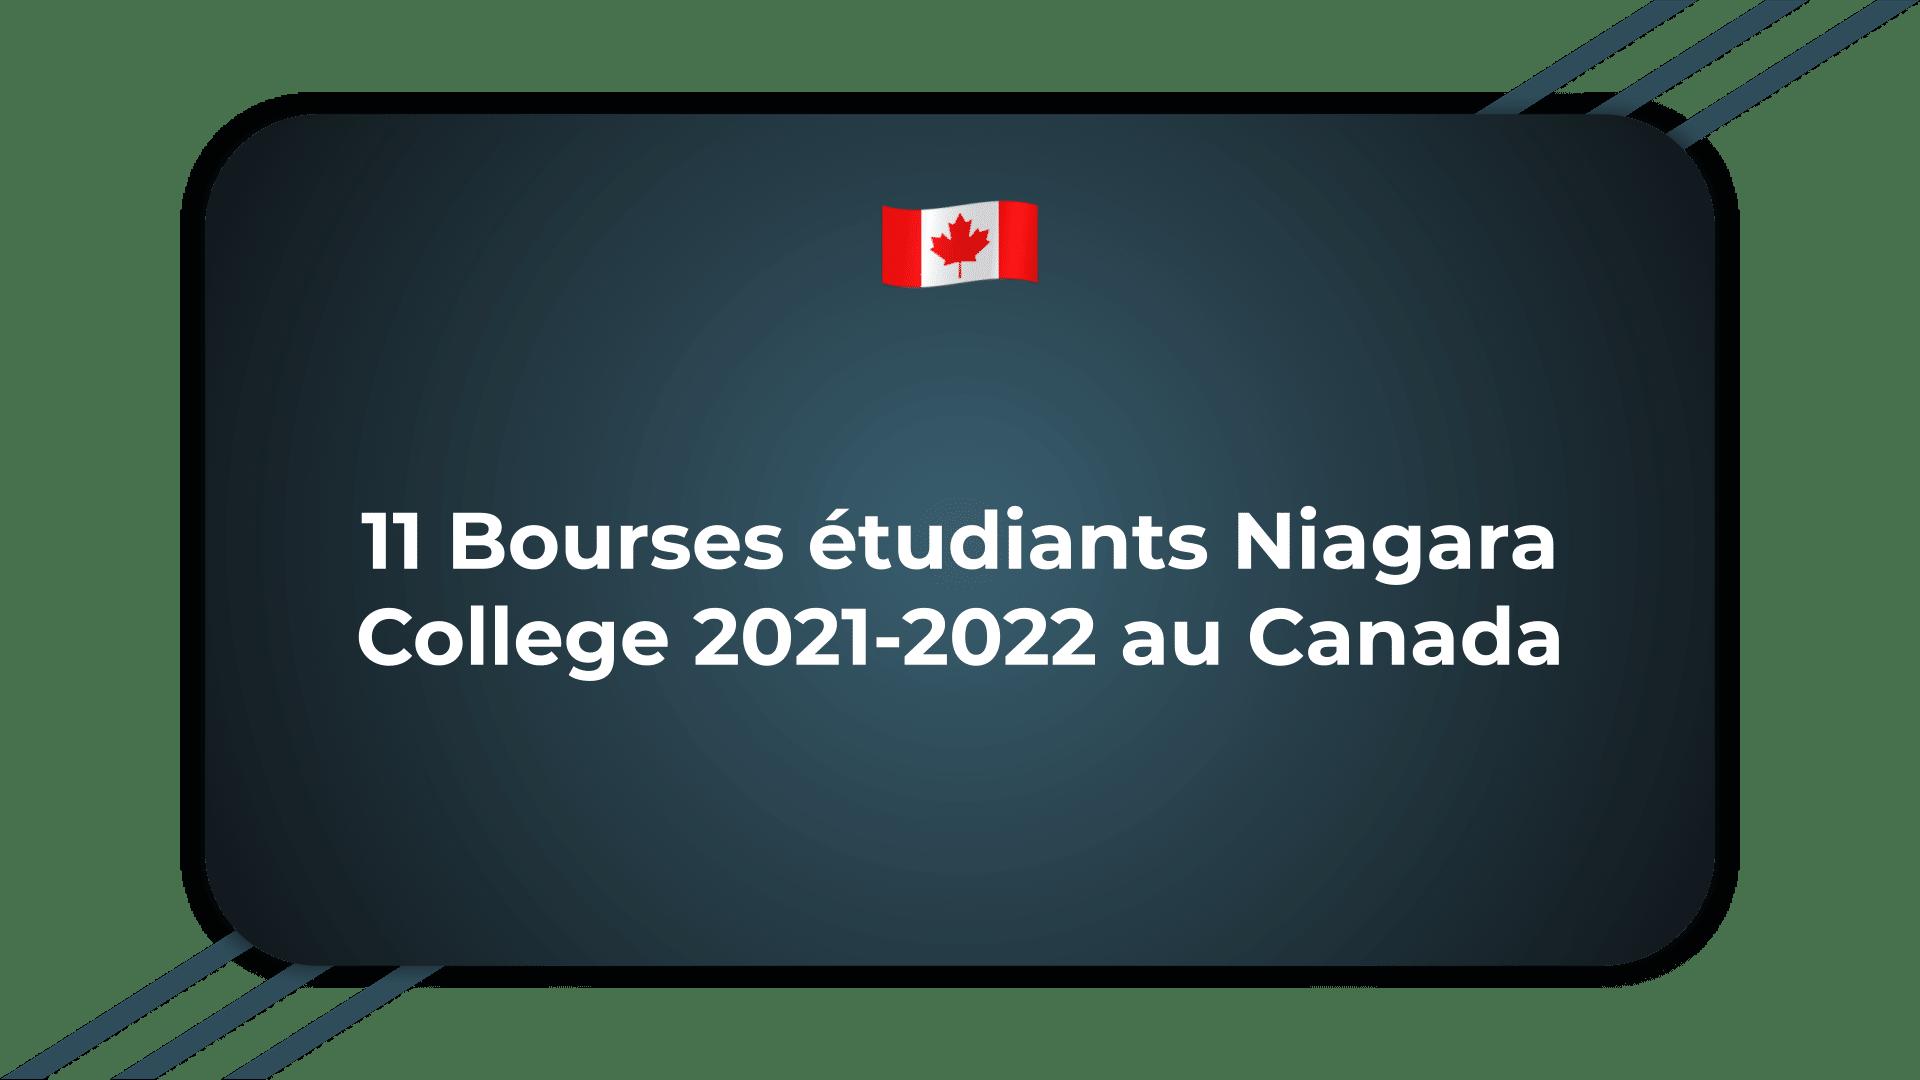 11 Bourses étudiants Niagara College